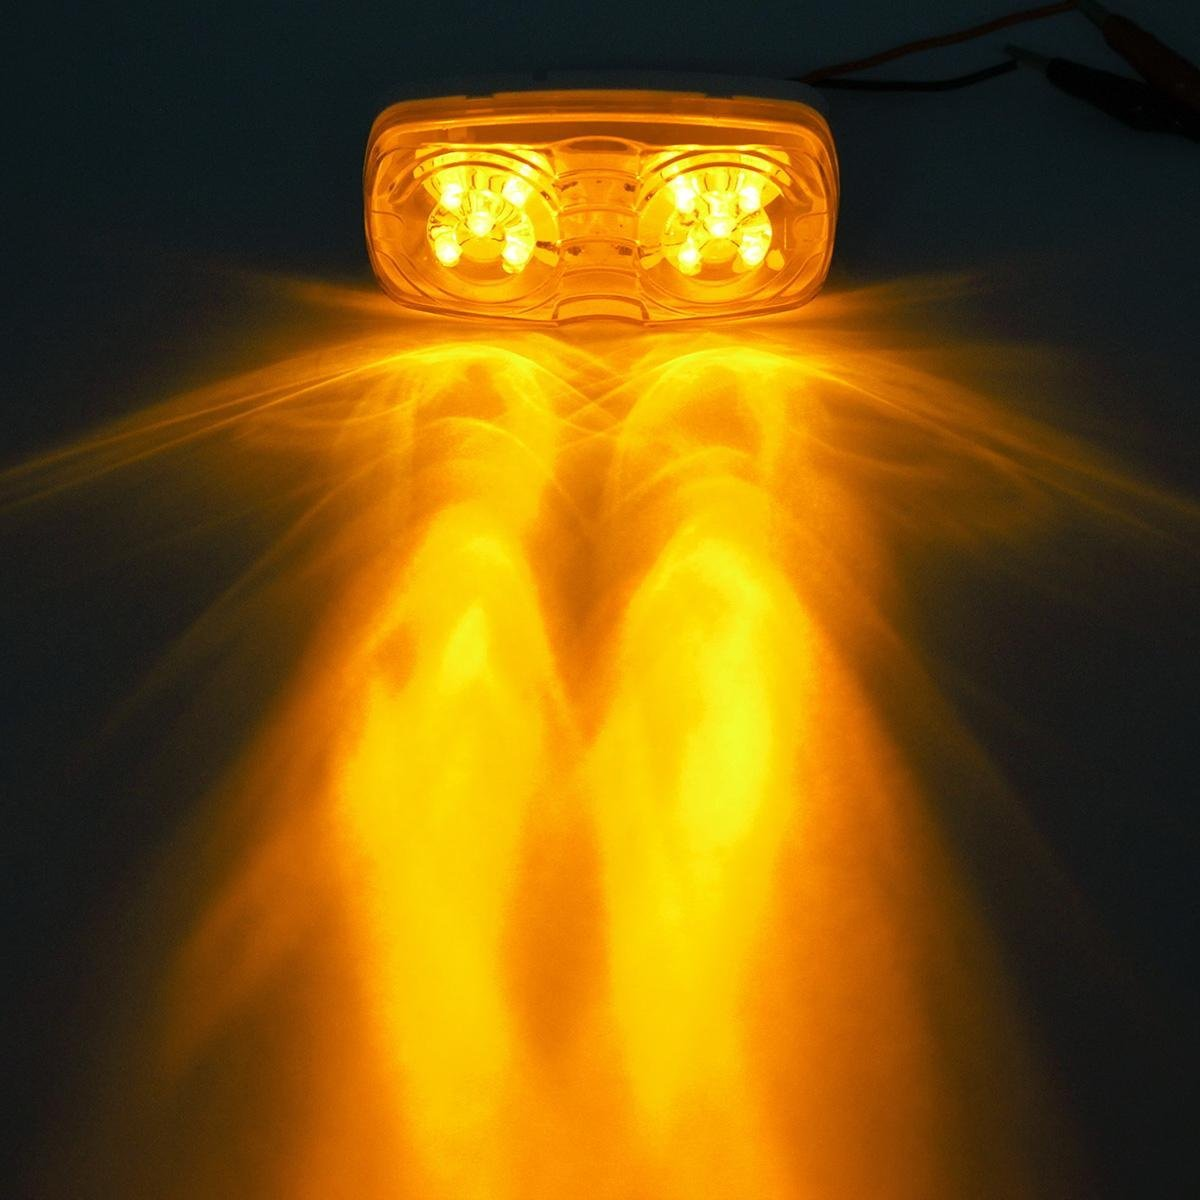 Partsam Five Trailer Marker LED Light Double Bullseye Amber 10 Diodes Clearance Light by Partsam (Image #9)